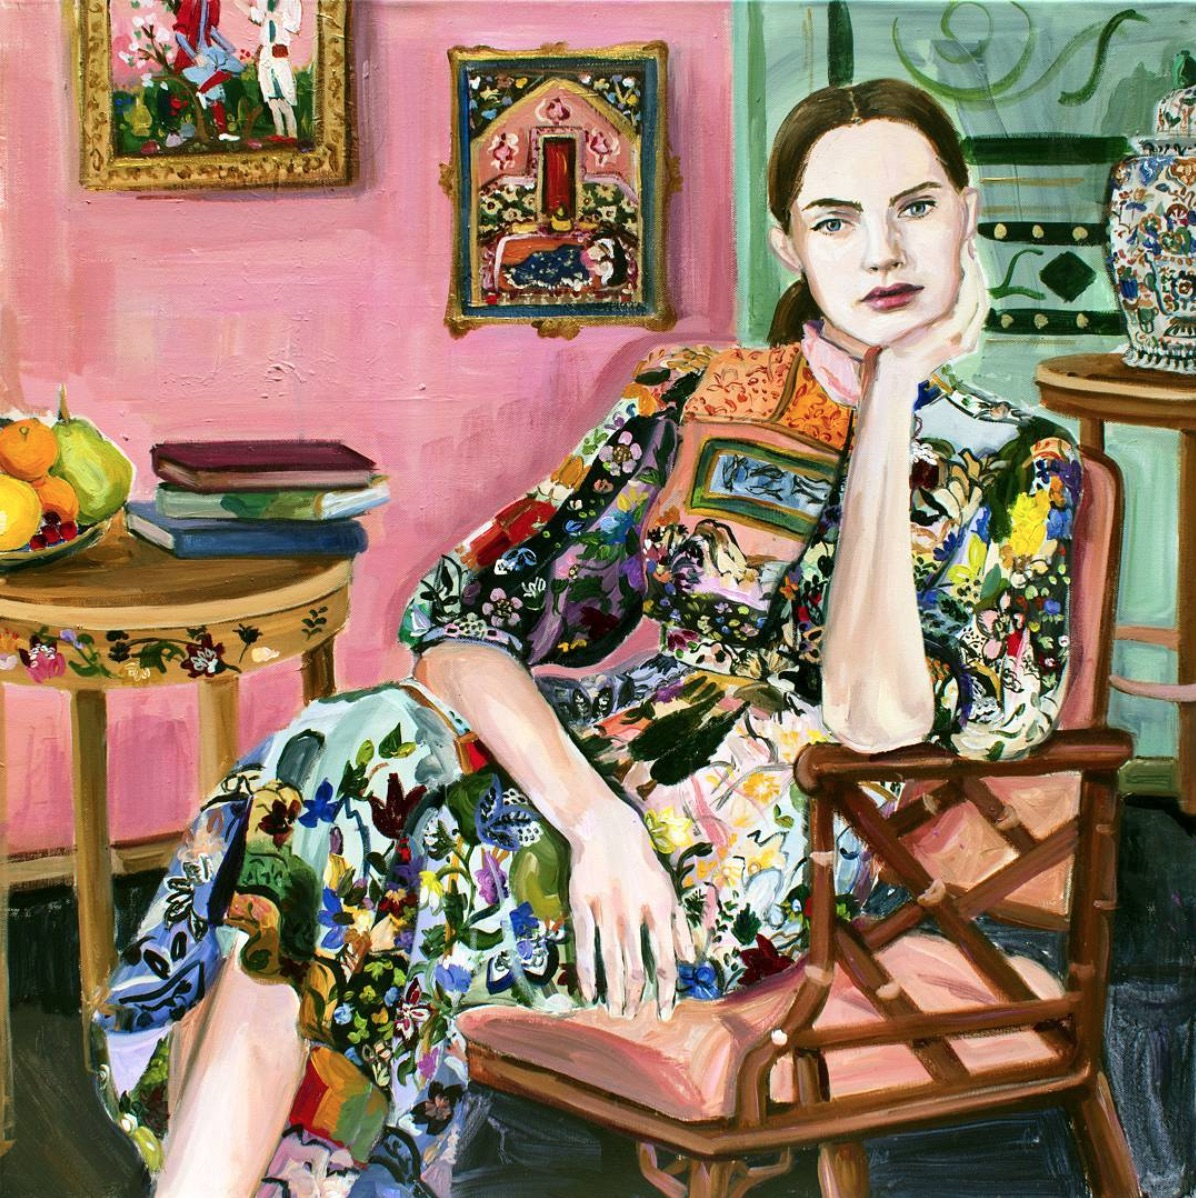 laura gulshani,illustratrice,dessins,peinture,art,mode,fashion,backstages,fashion shows,toronto